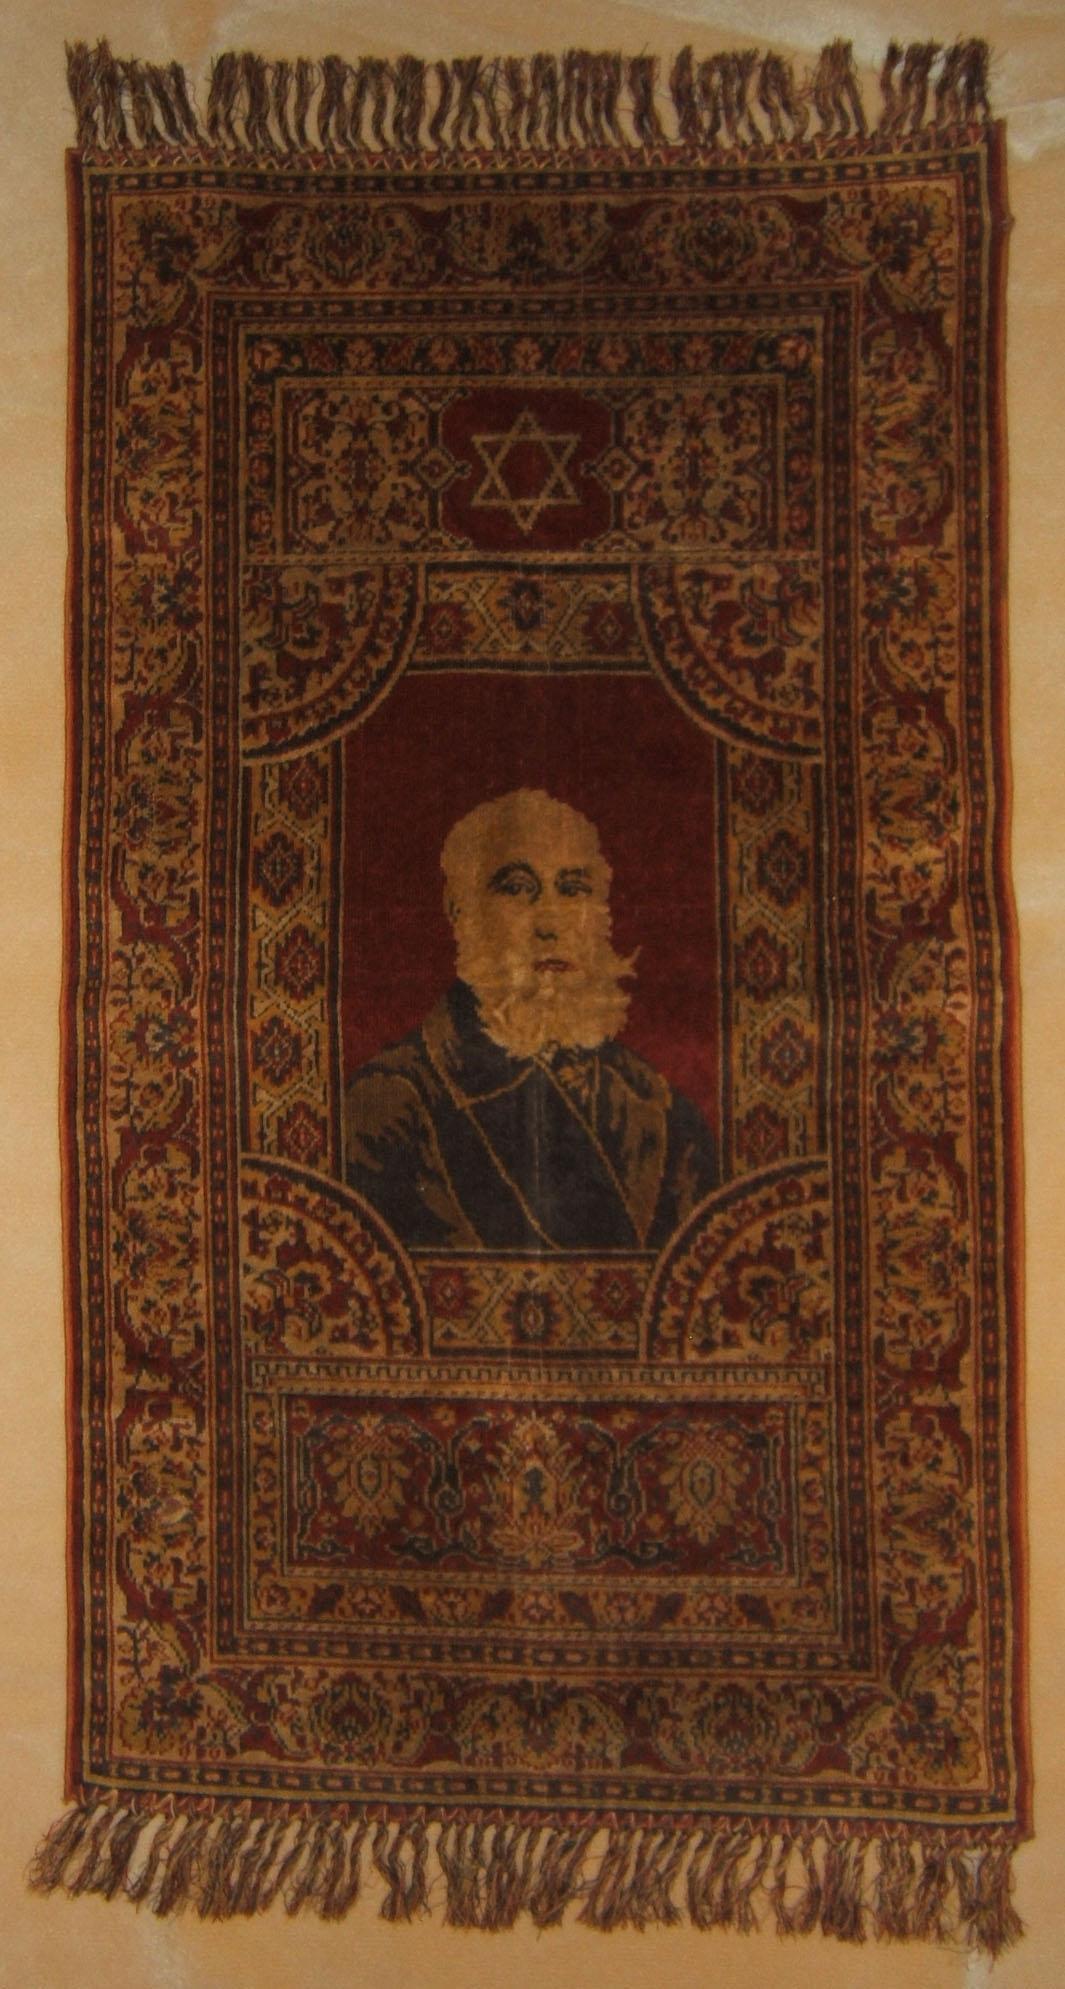 Palestine/E.I. Max Nordau Zionist rug, circa. 1905-1911/1923